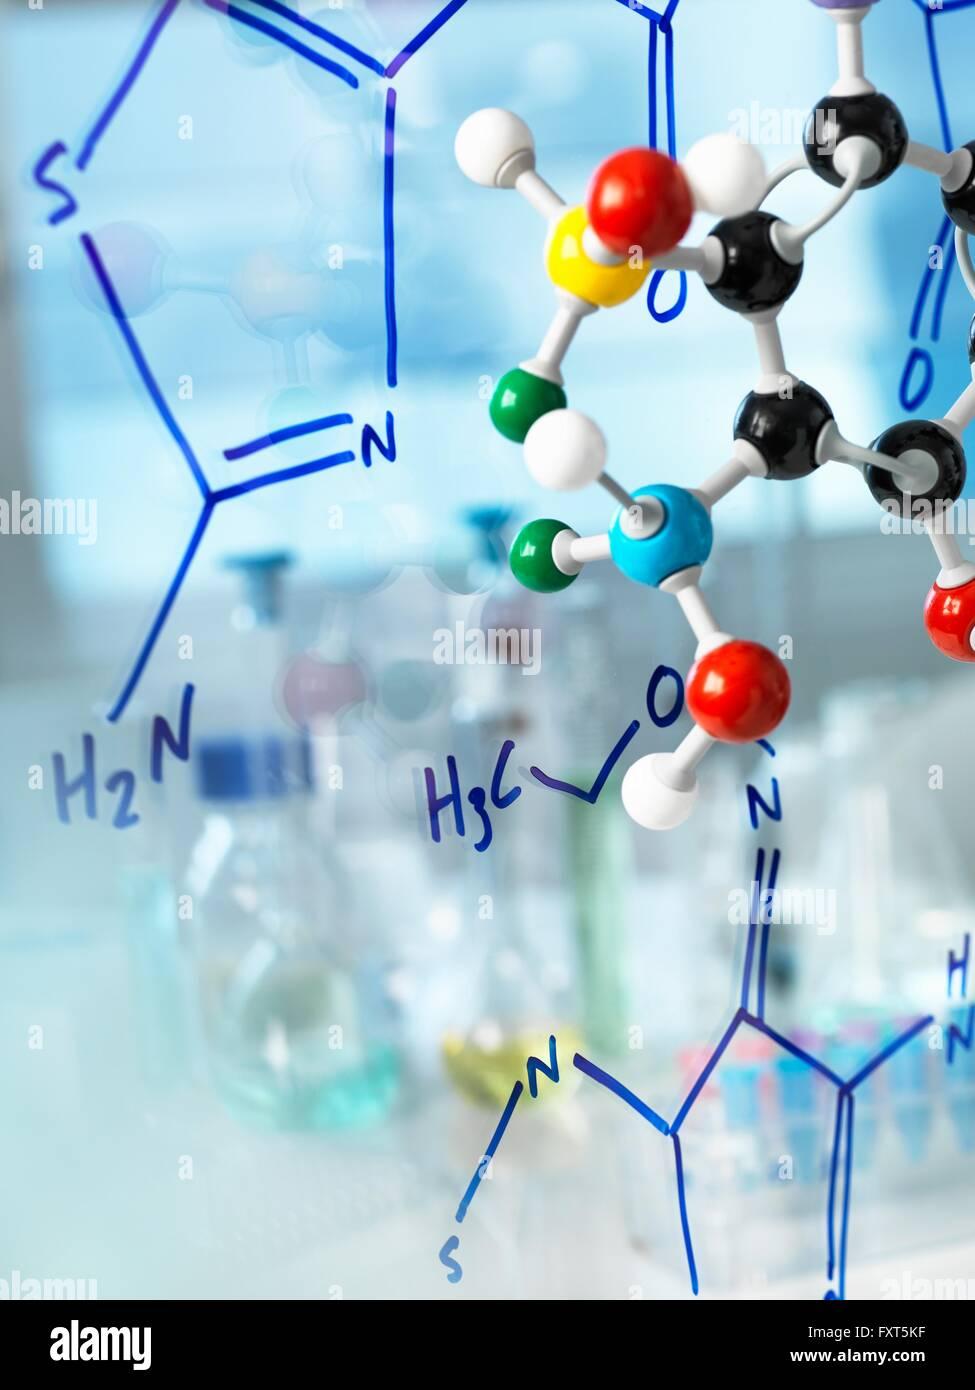 Ball und Stock Molekülmodell mit Formel des neuen Medikaments geschrieben am Glas Stockbild